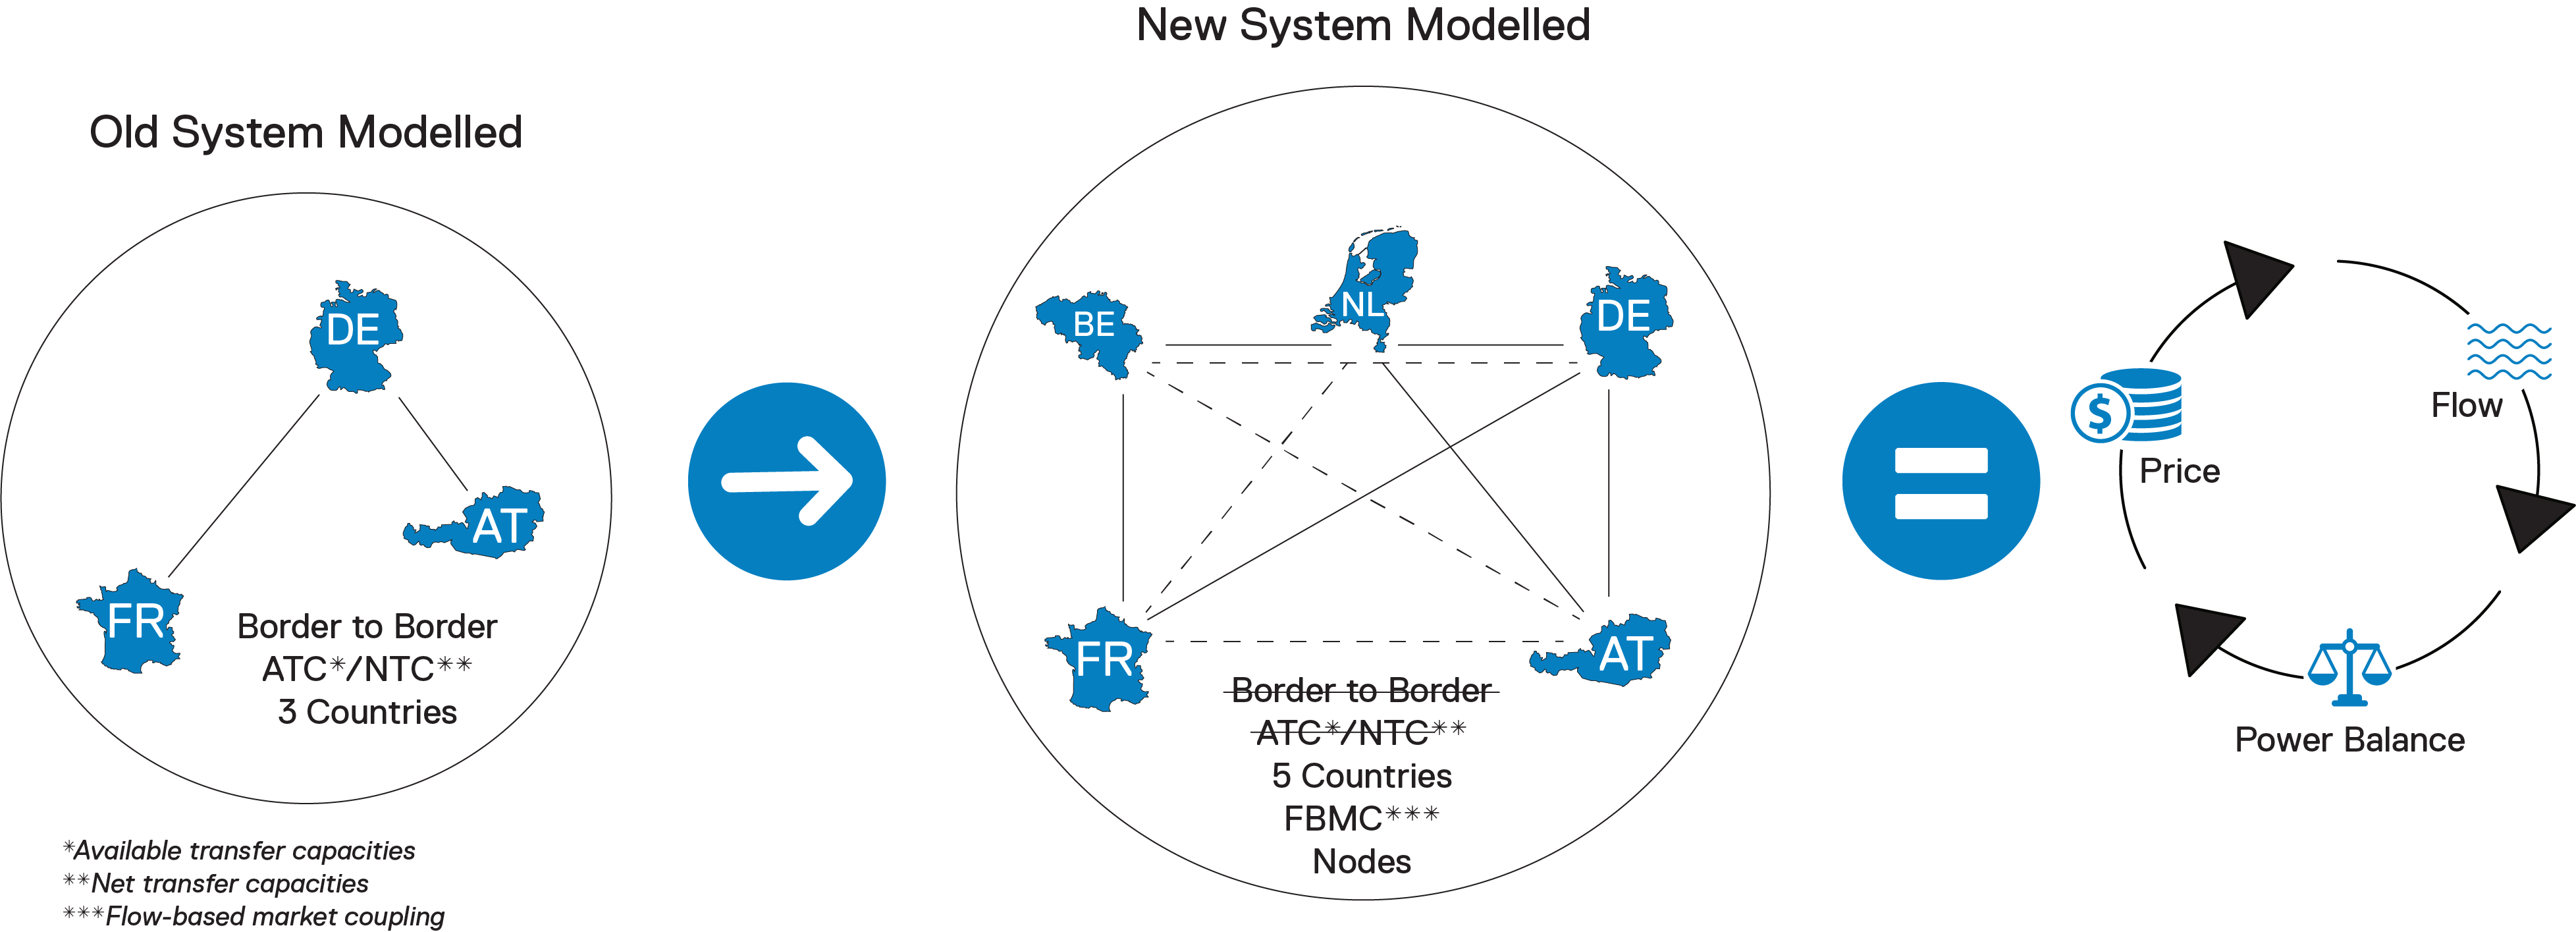 Flow Based Model IG no tab